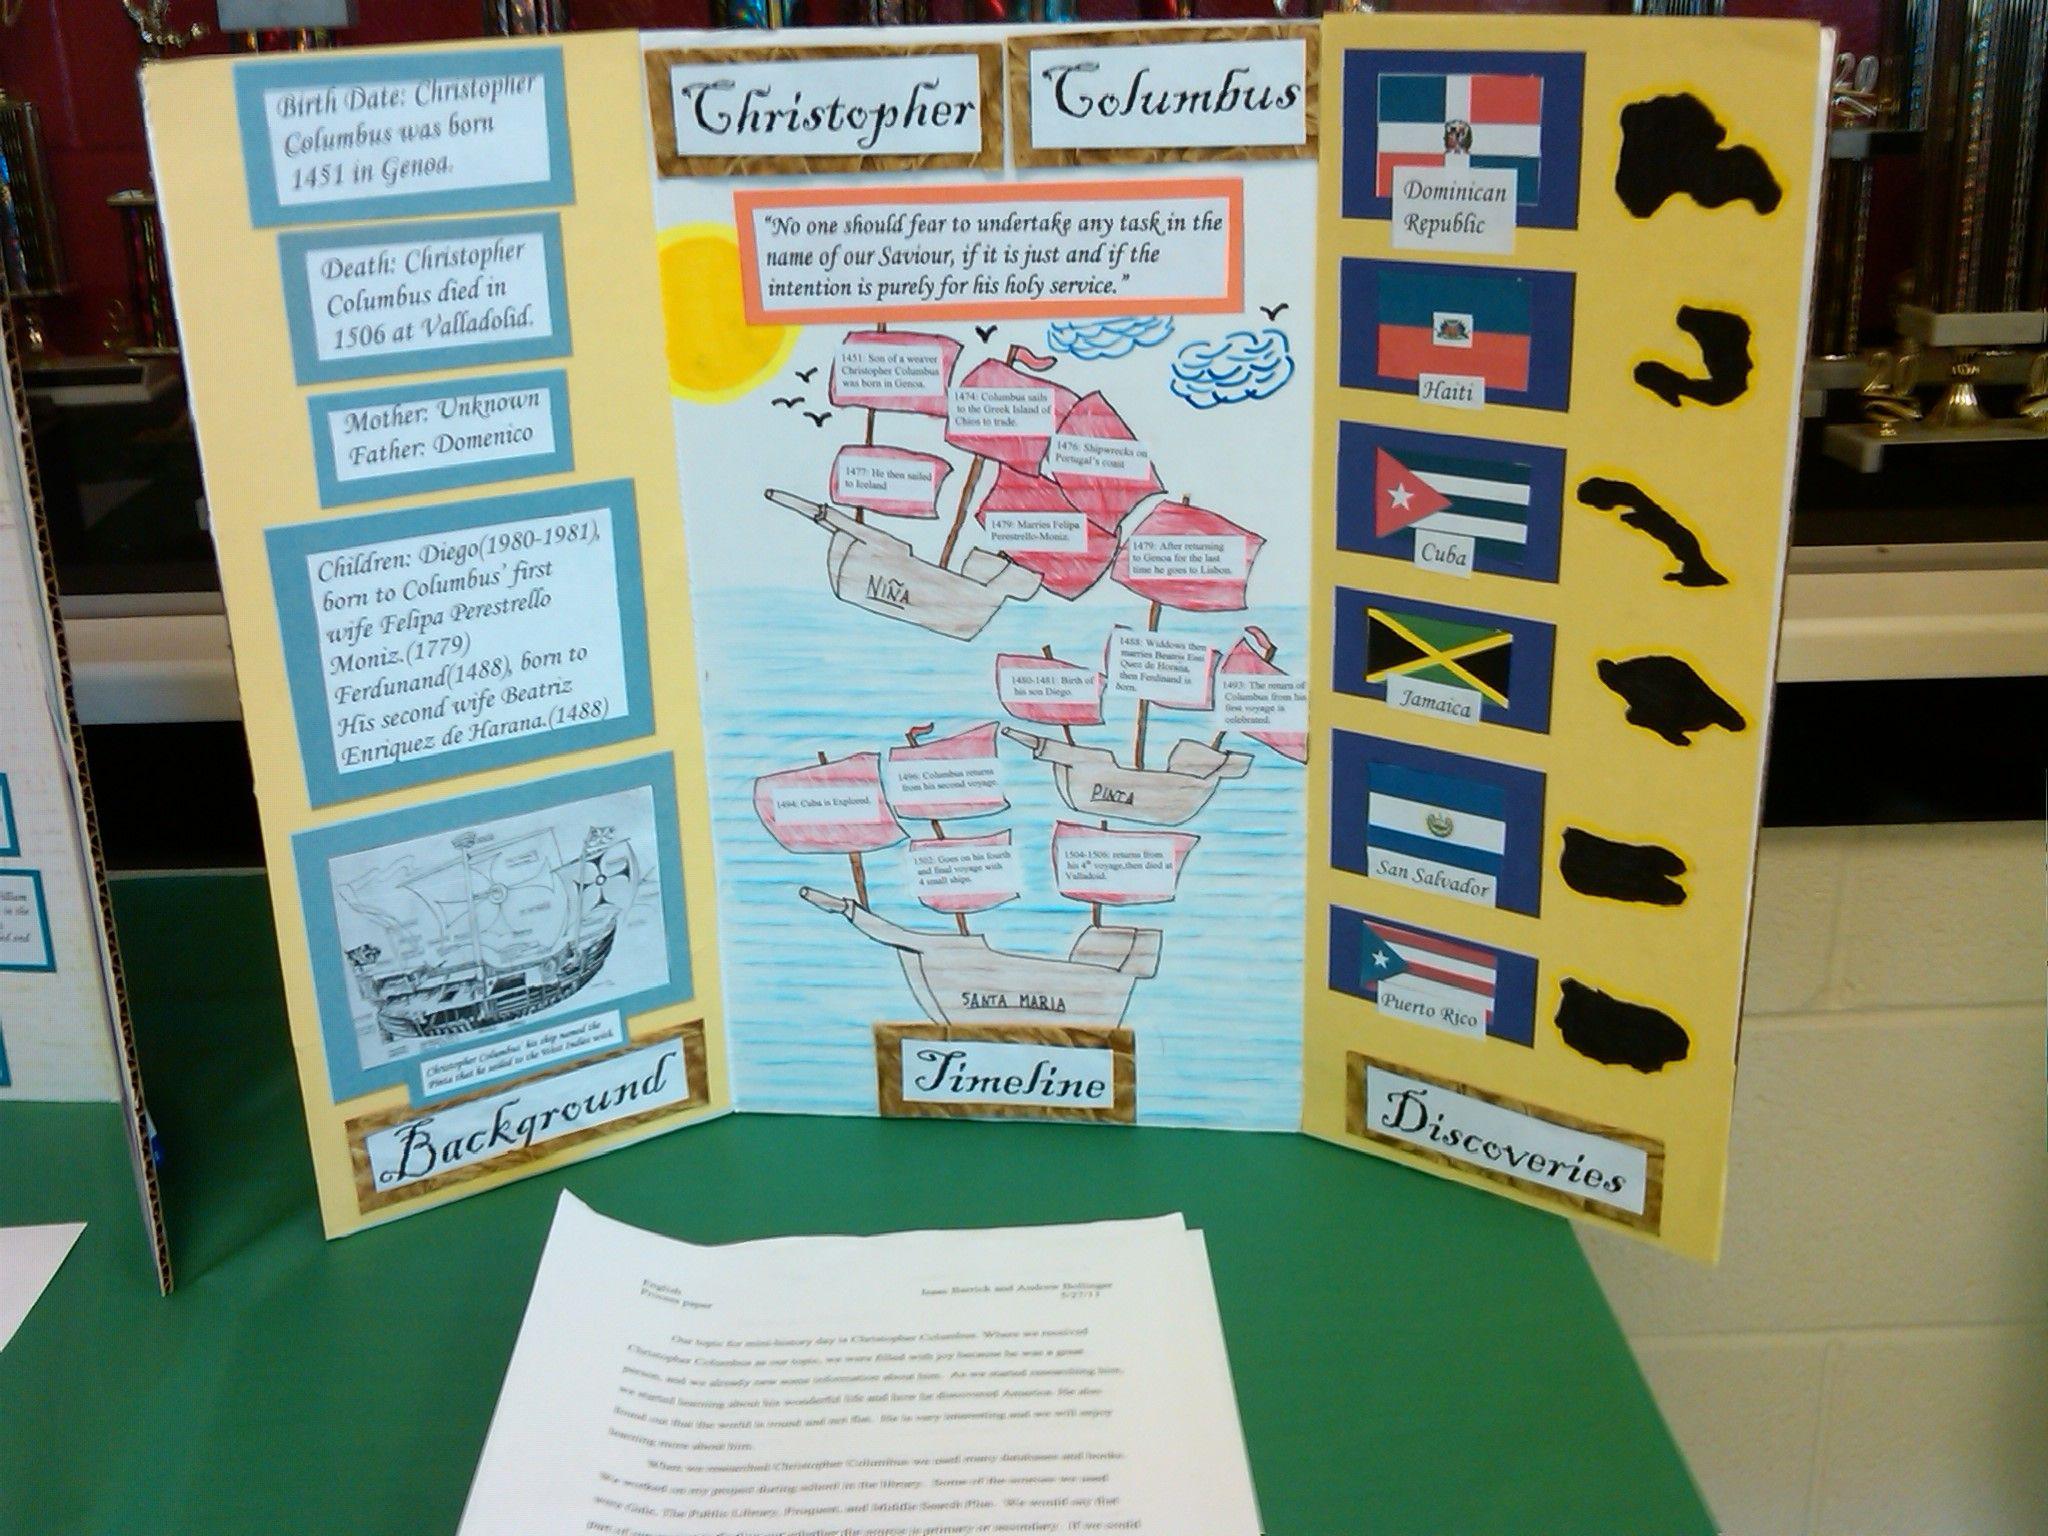 Scrapbook ideas history projects - History Project Board Ideas Google Search